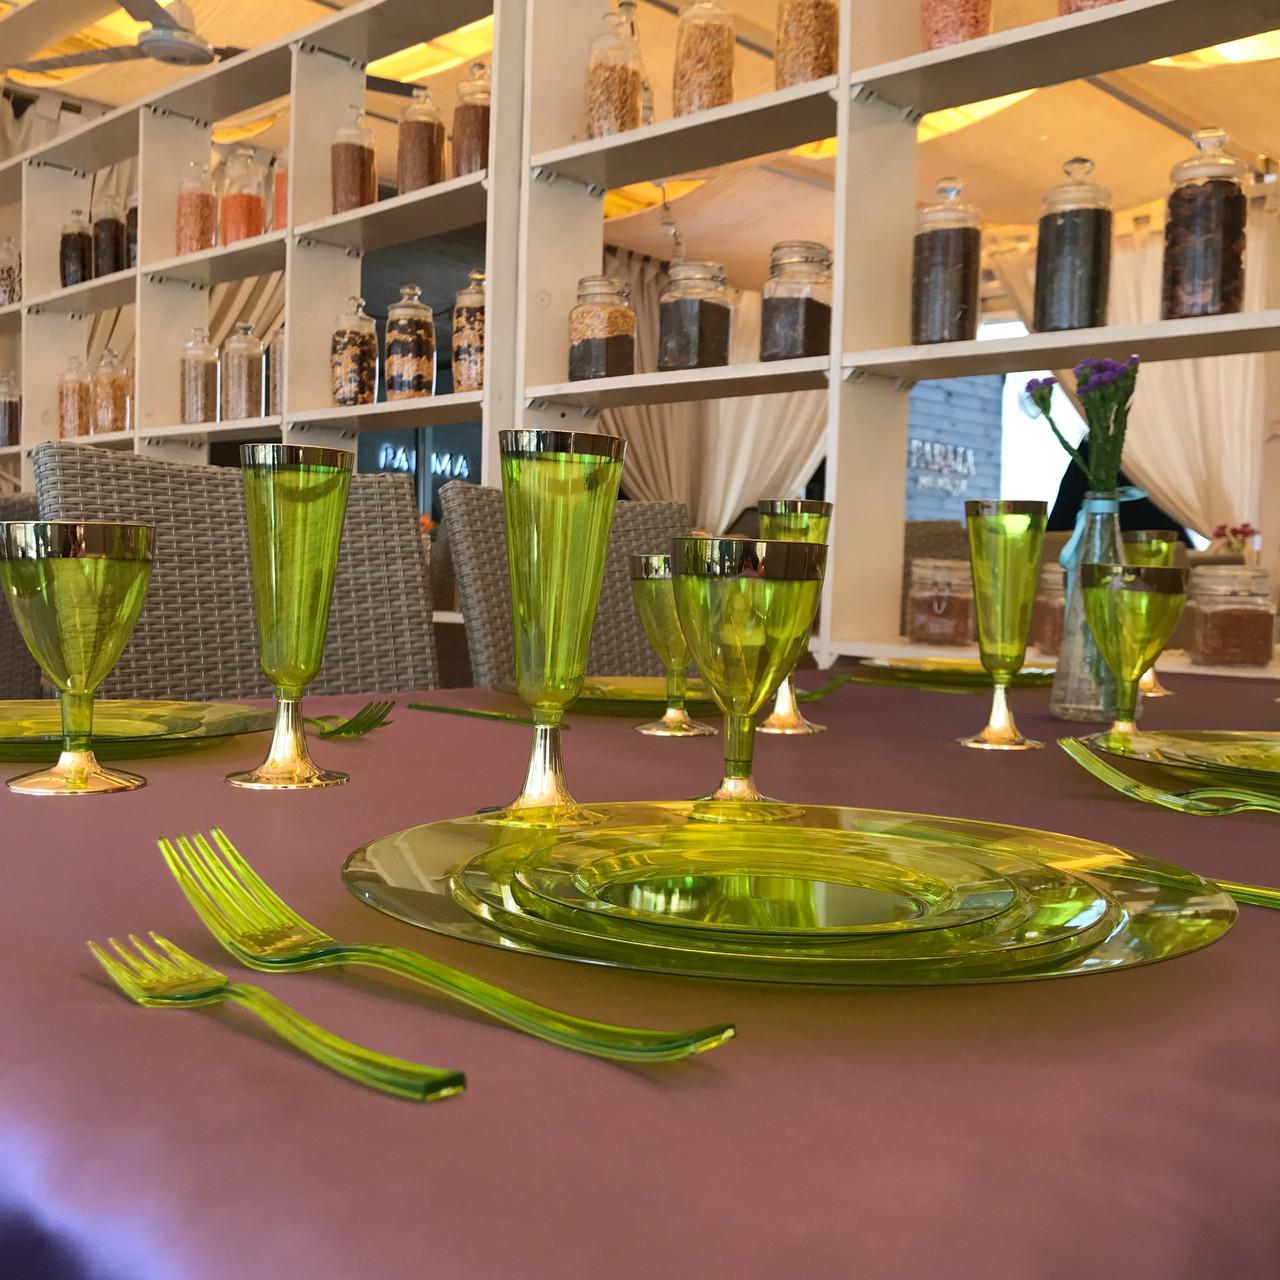 Вилка одноразовая десертная стеклопластик  для банкета, презентации, выставки 130 мм 24 шт Capital For People.